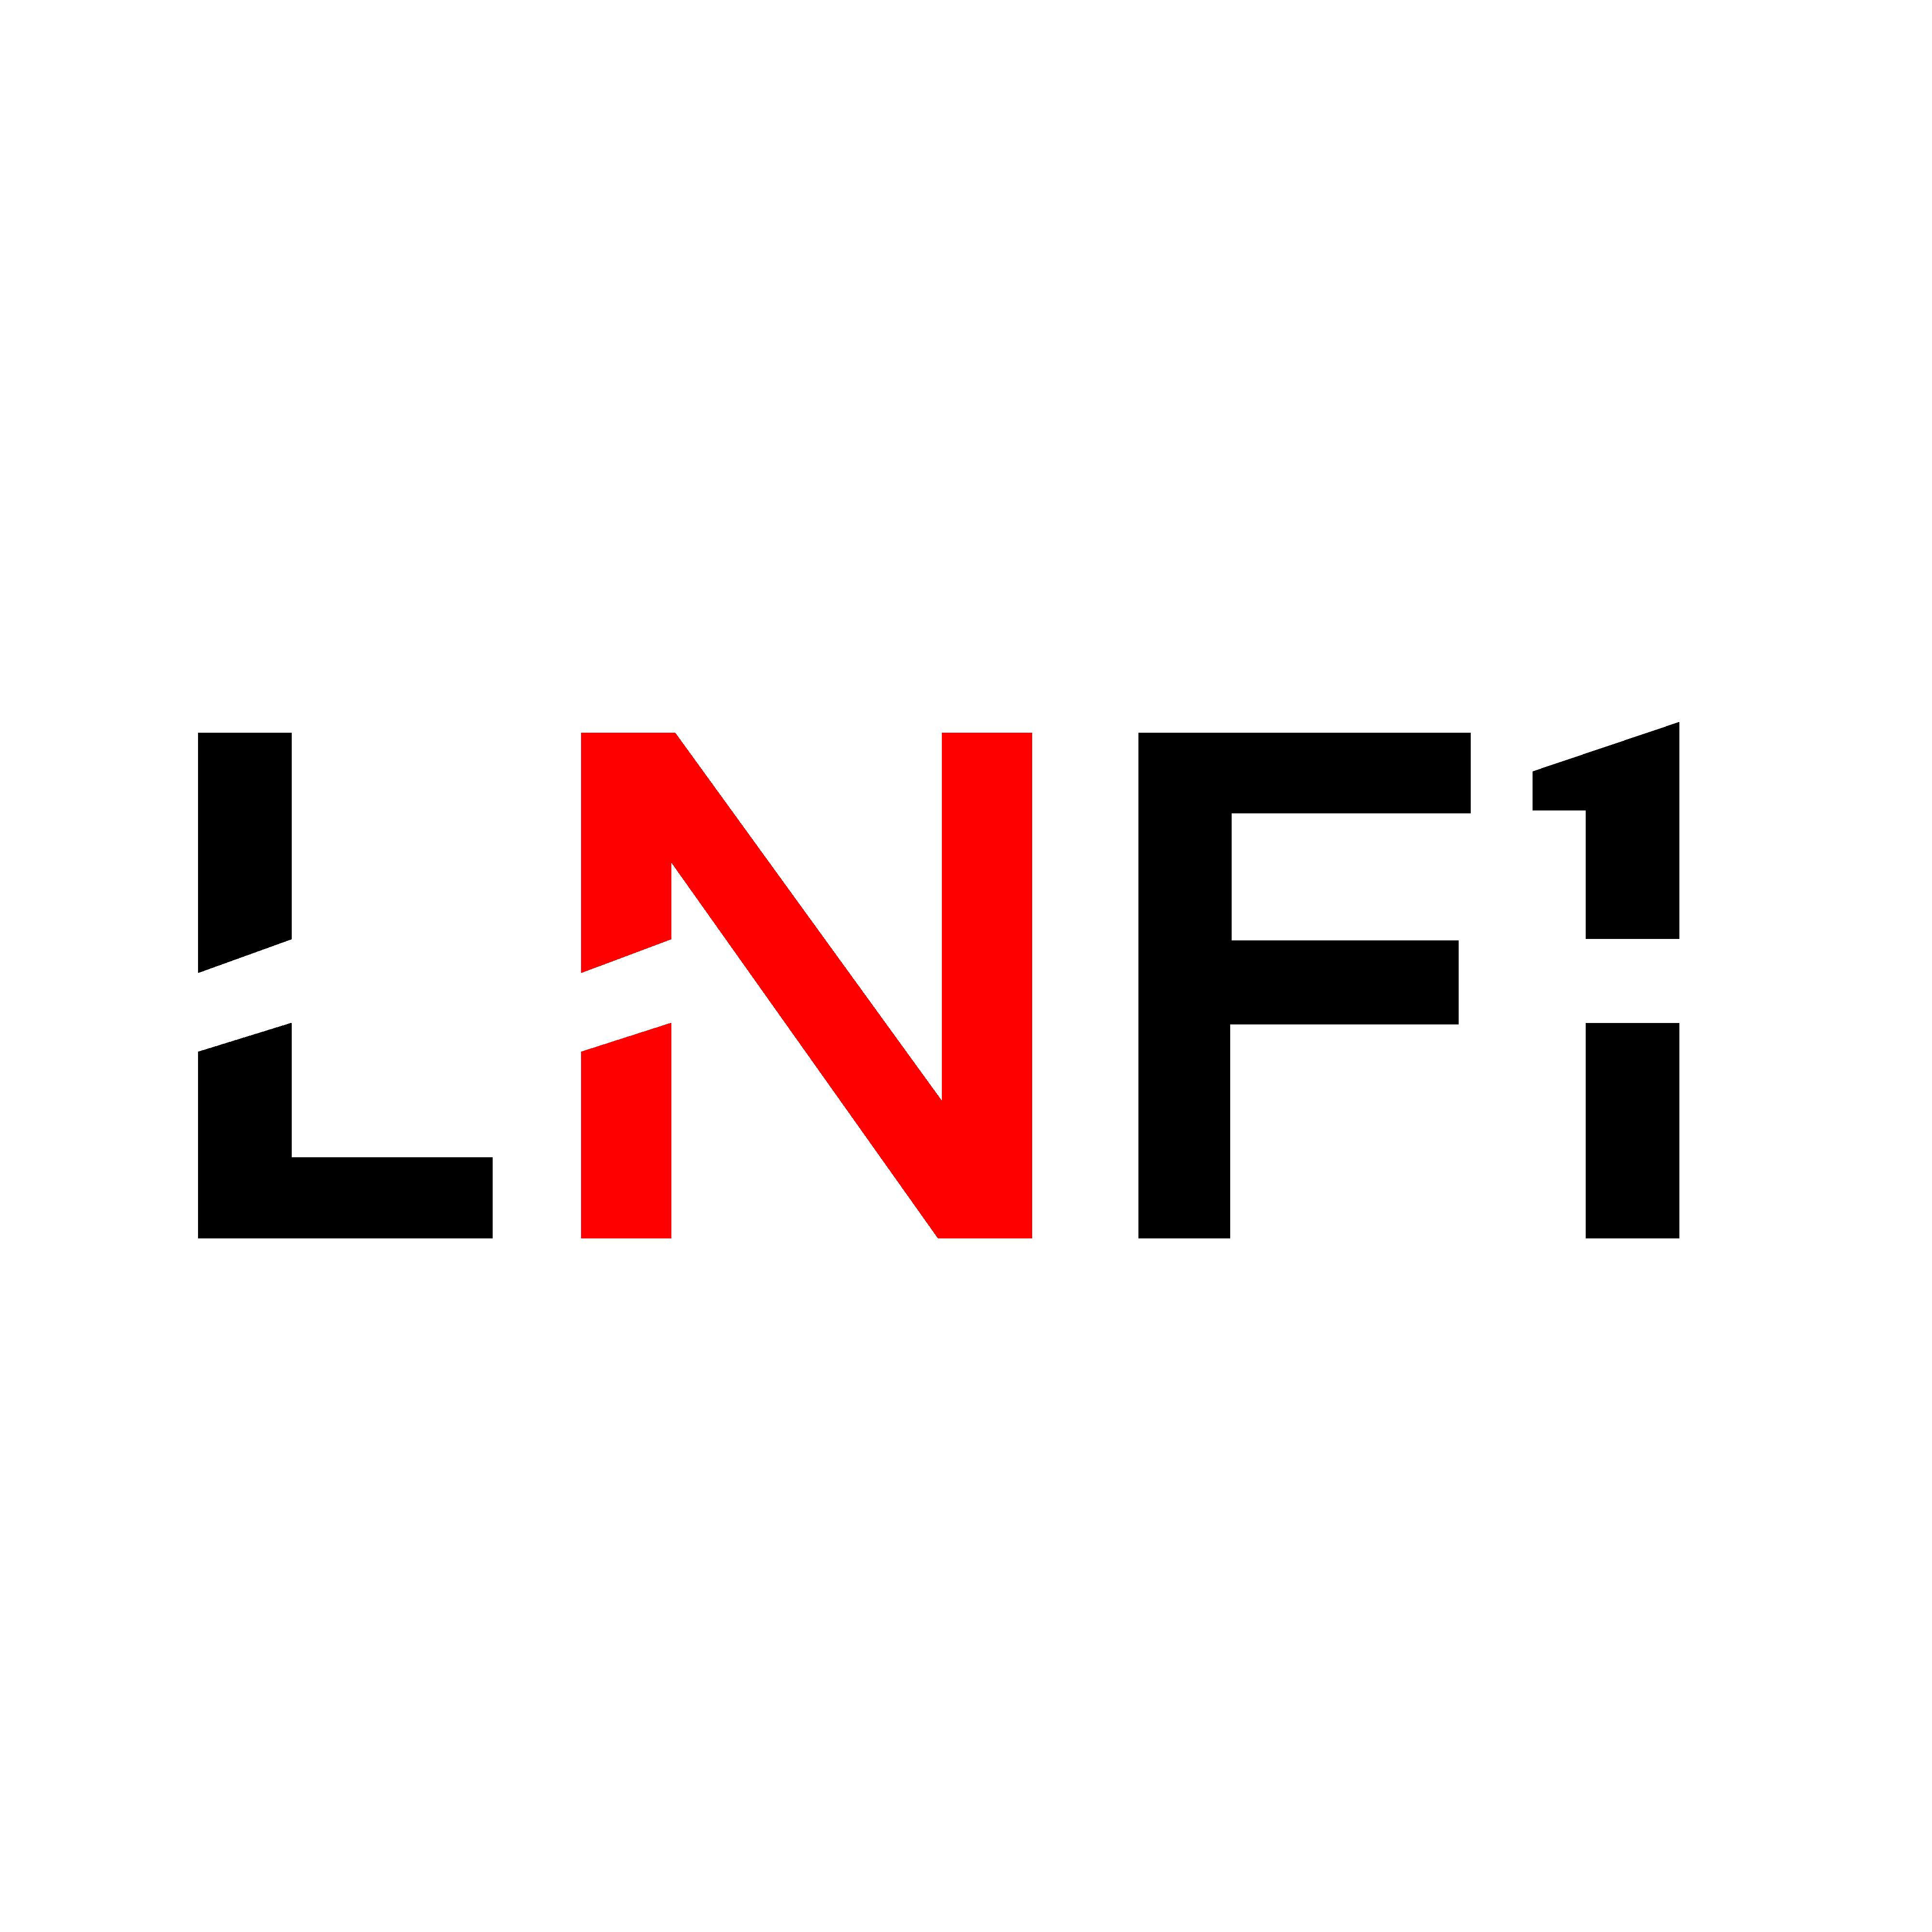 LaczynasF1